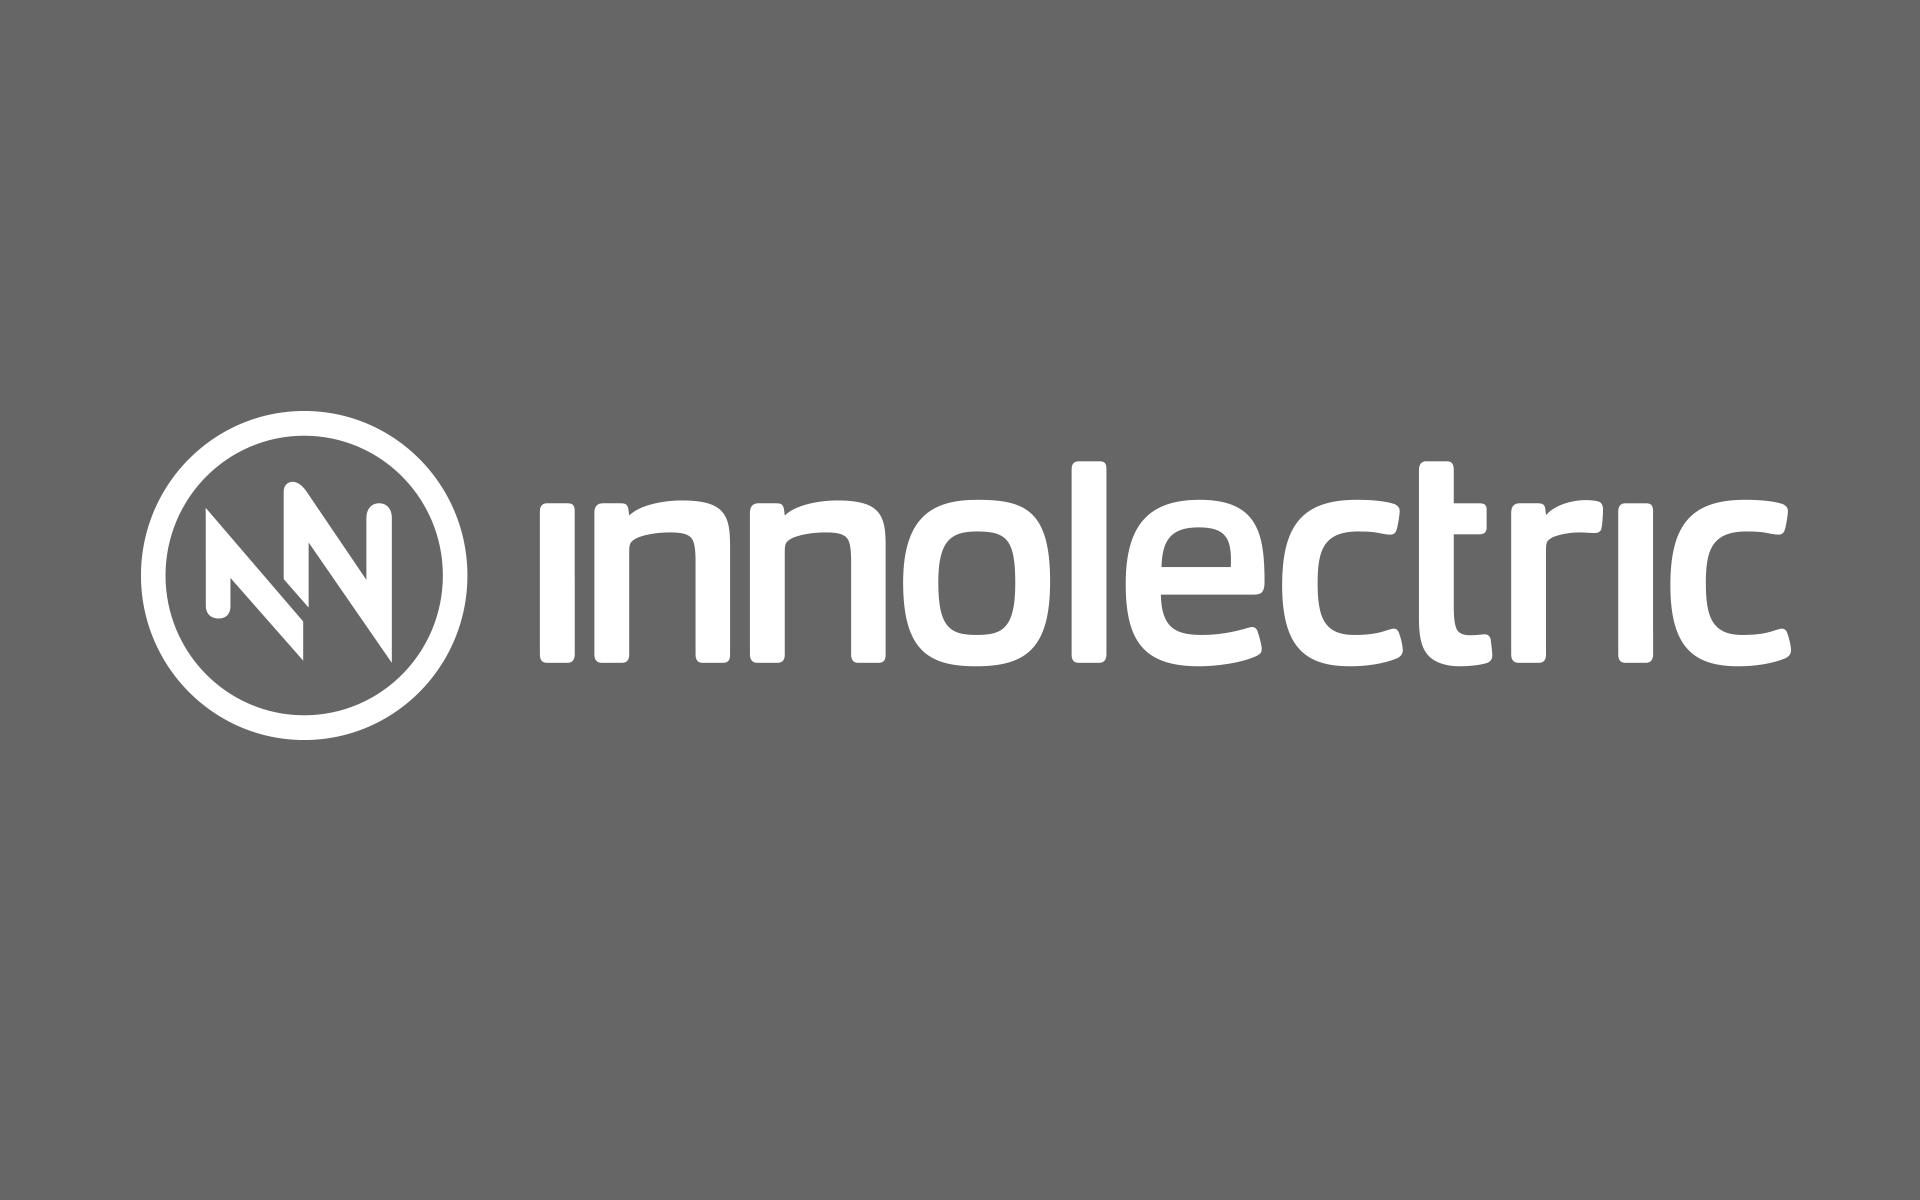 innolectric Corporate Design, Logotype negativ